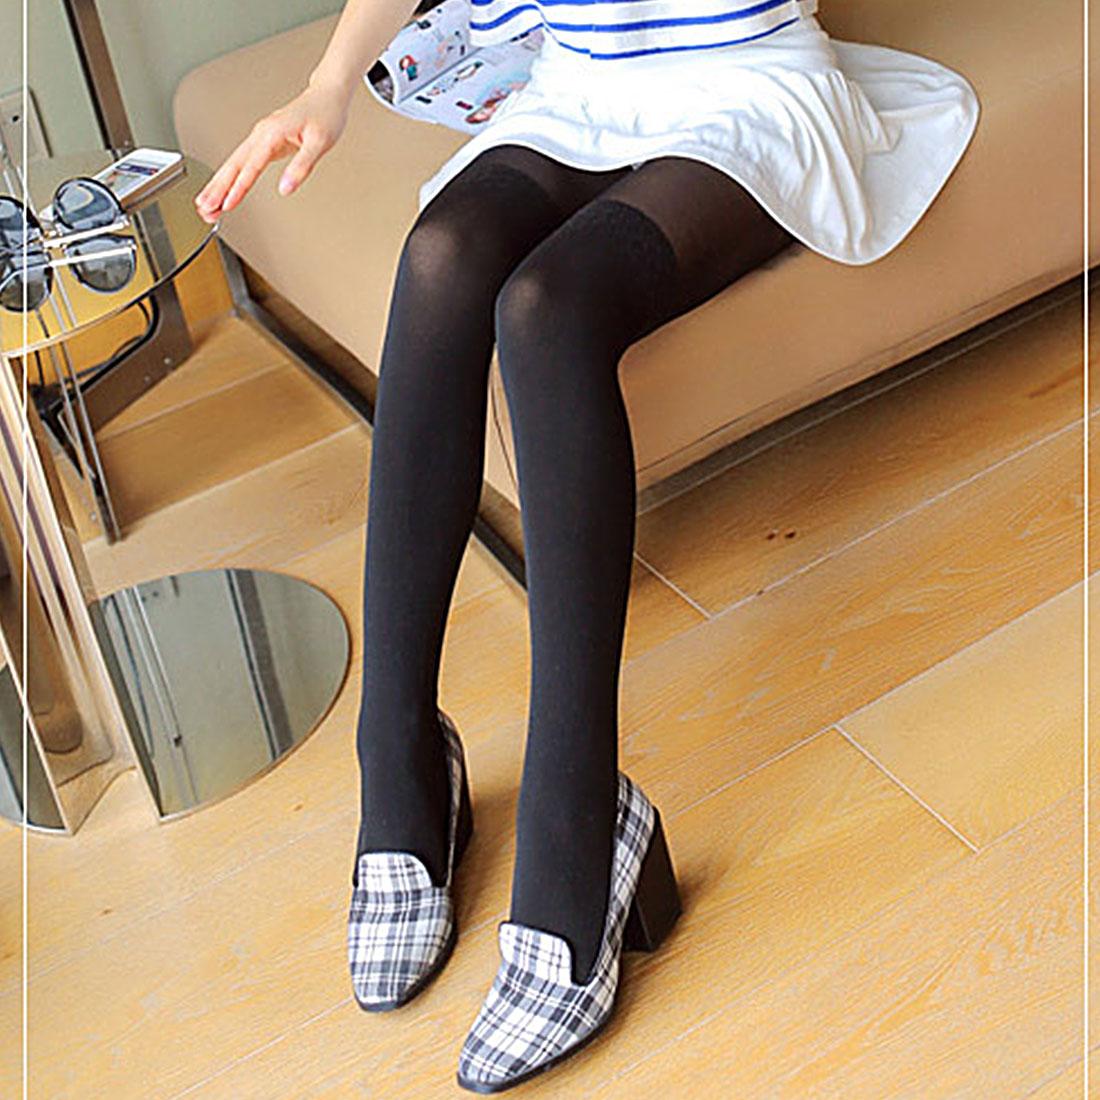 Harajuku Kawaii Fashion Black Stitching Lace Knee Stockings Patchwork Tattoo Tights Women Girls Sheer Footed